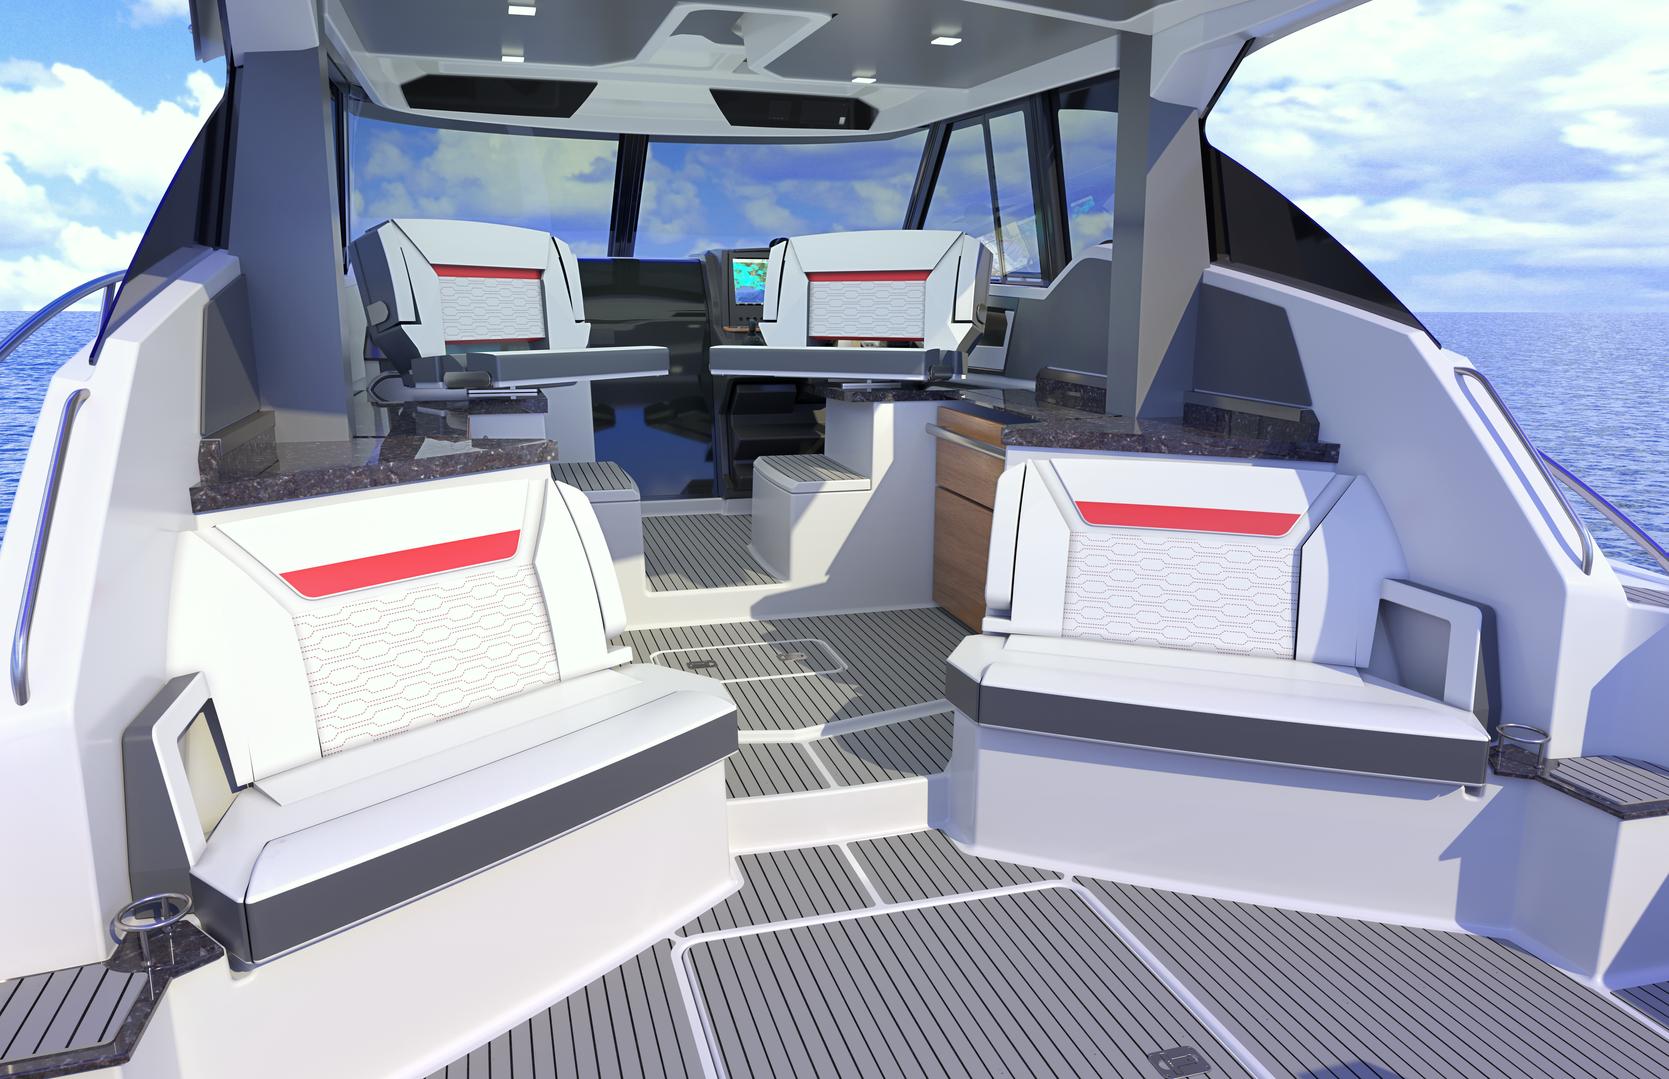 2020-04-17_BC-upper cockpit asymmetry_fl